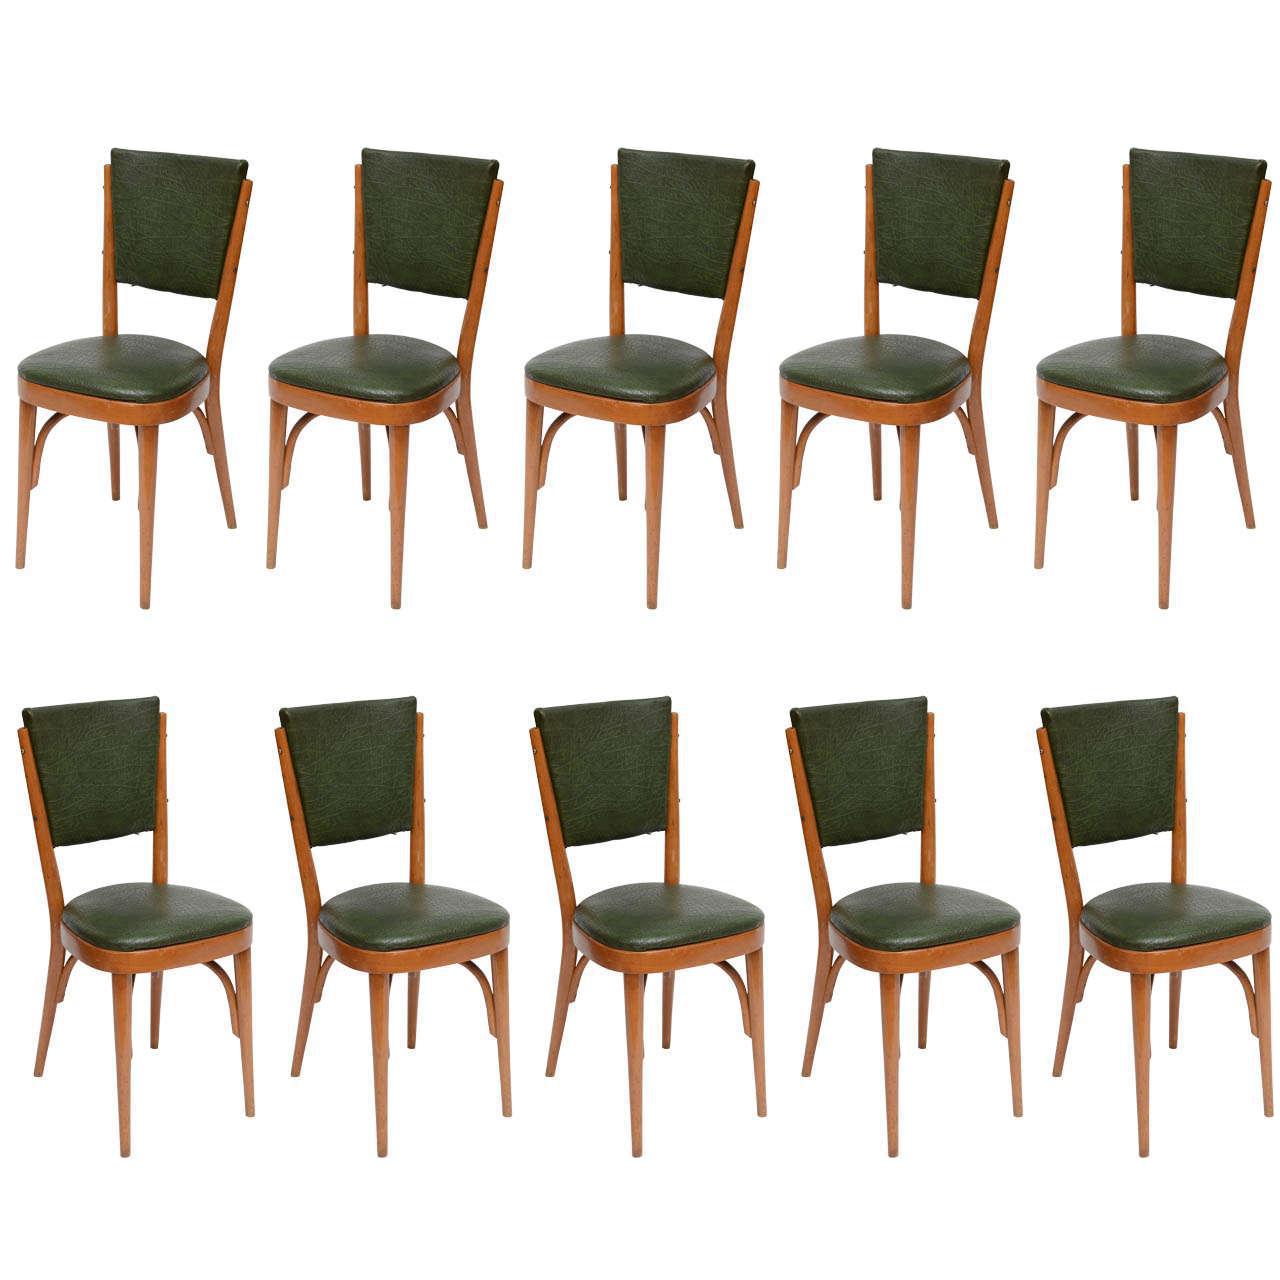 Italian Modernist Bistro Chairs, Set Of 10